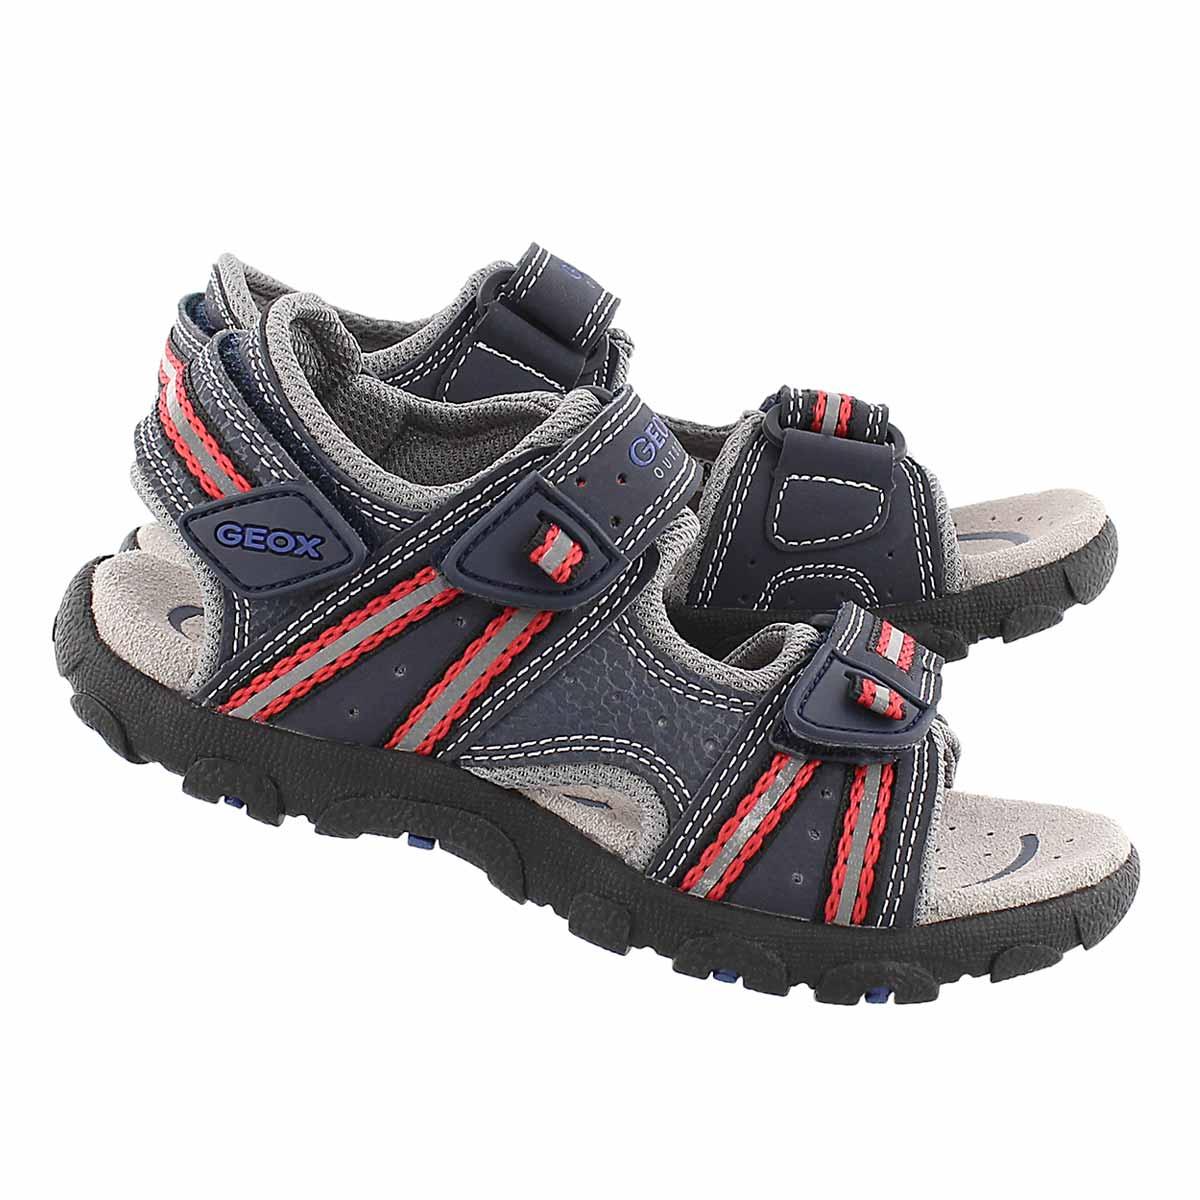 Sandale sport STRADA, marine/rge, garçon